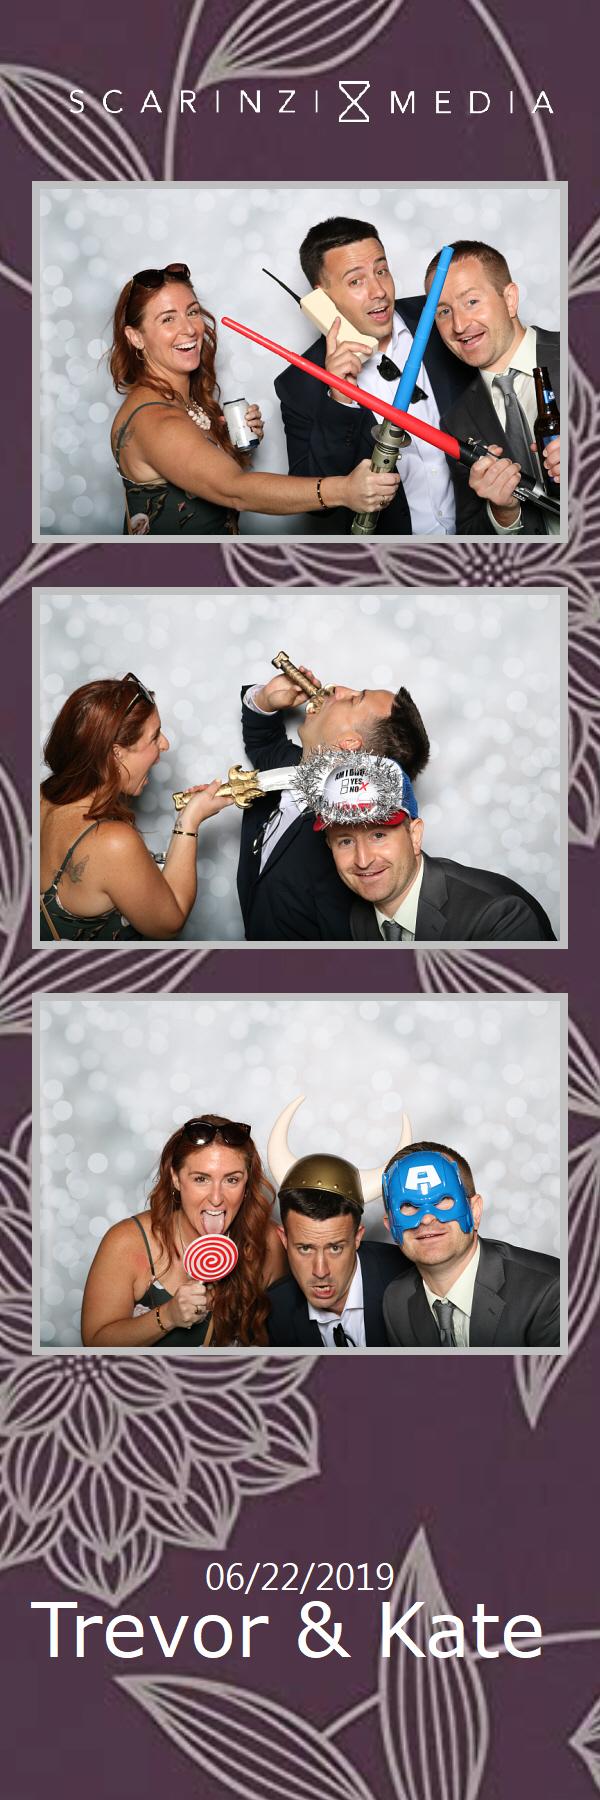 2019.06.22 - Barney Wedding PHOTOBOOTH02.jpg